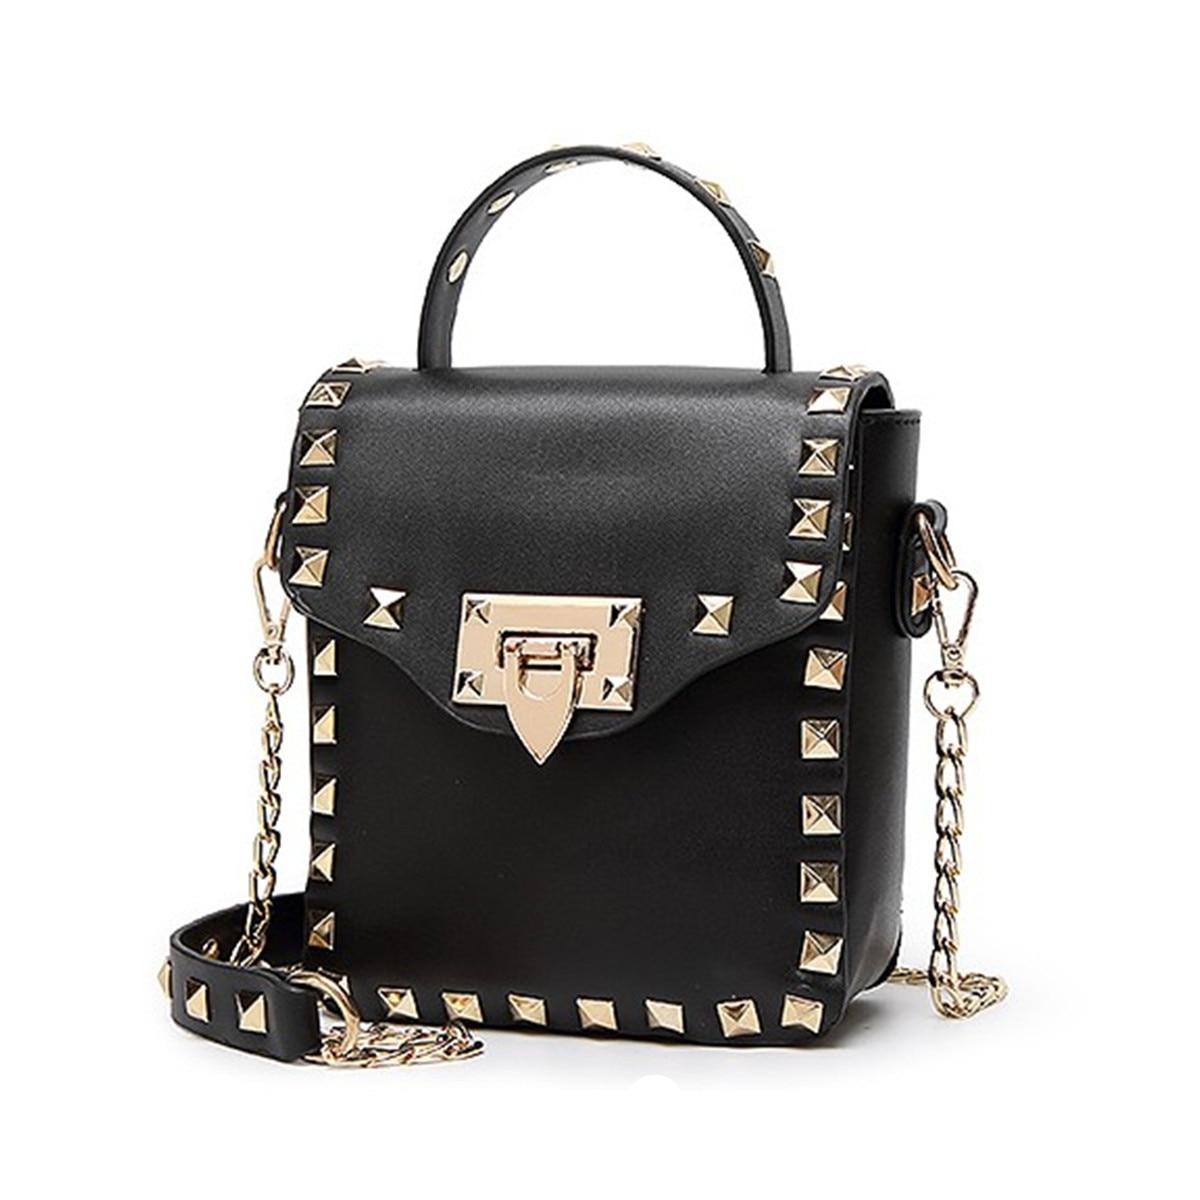 2016 Women Bag Fashion Women Messenger Stud Bags Rivet Chain Shoulder Bag High Quality PU Leather